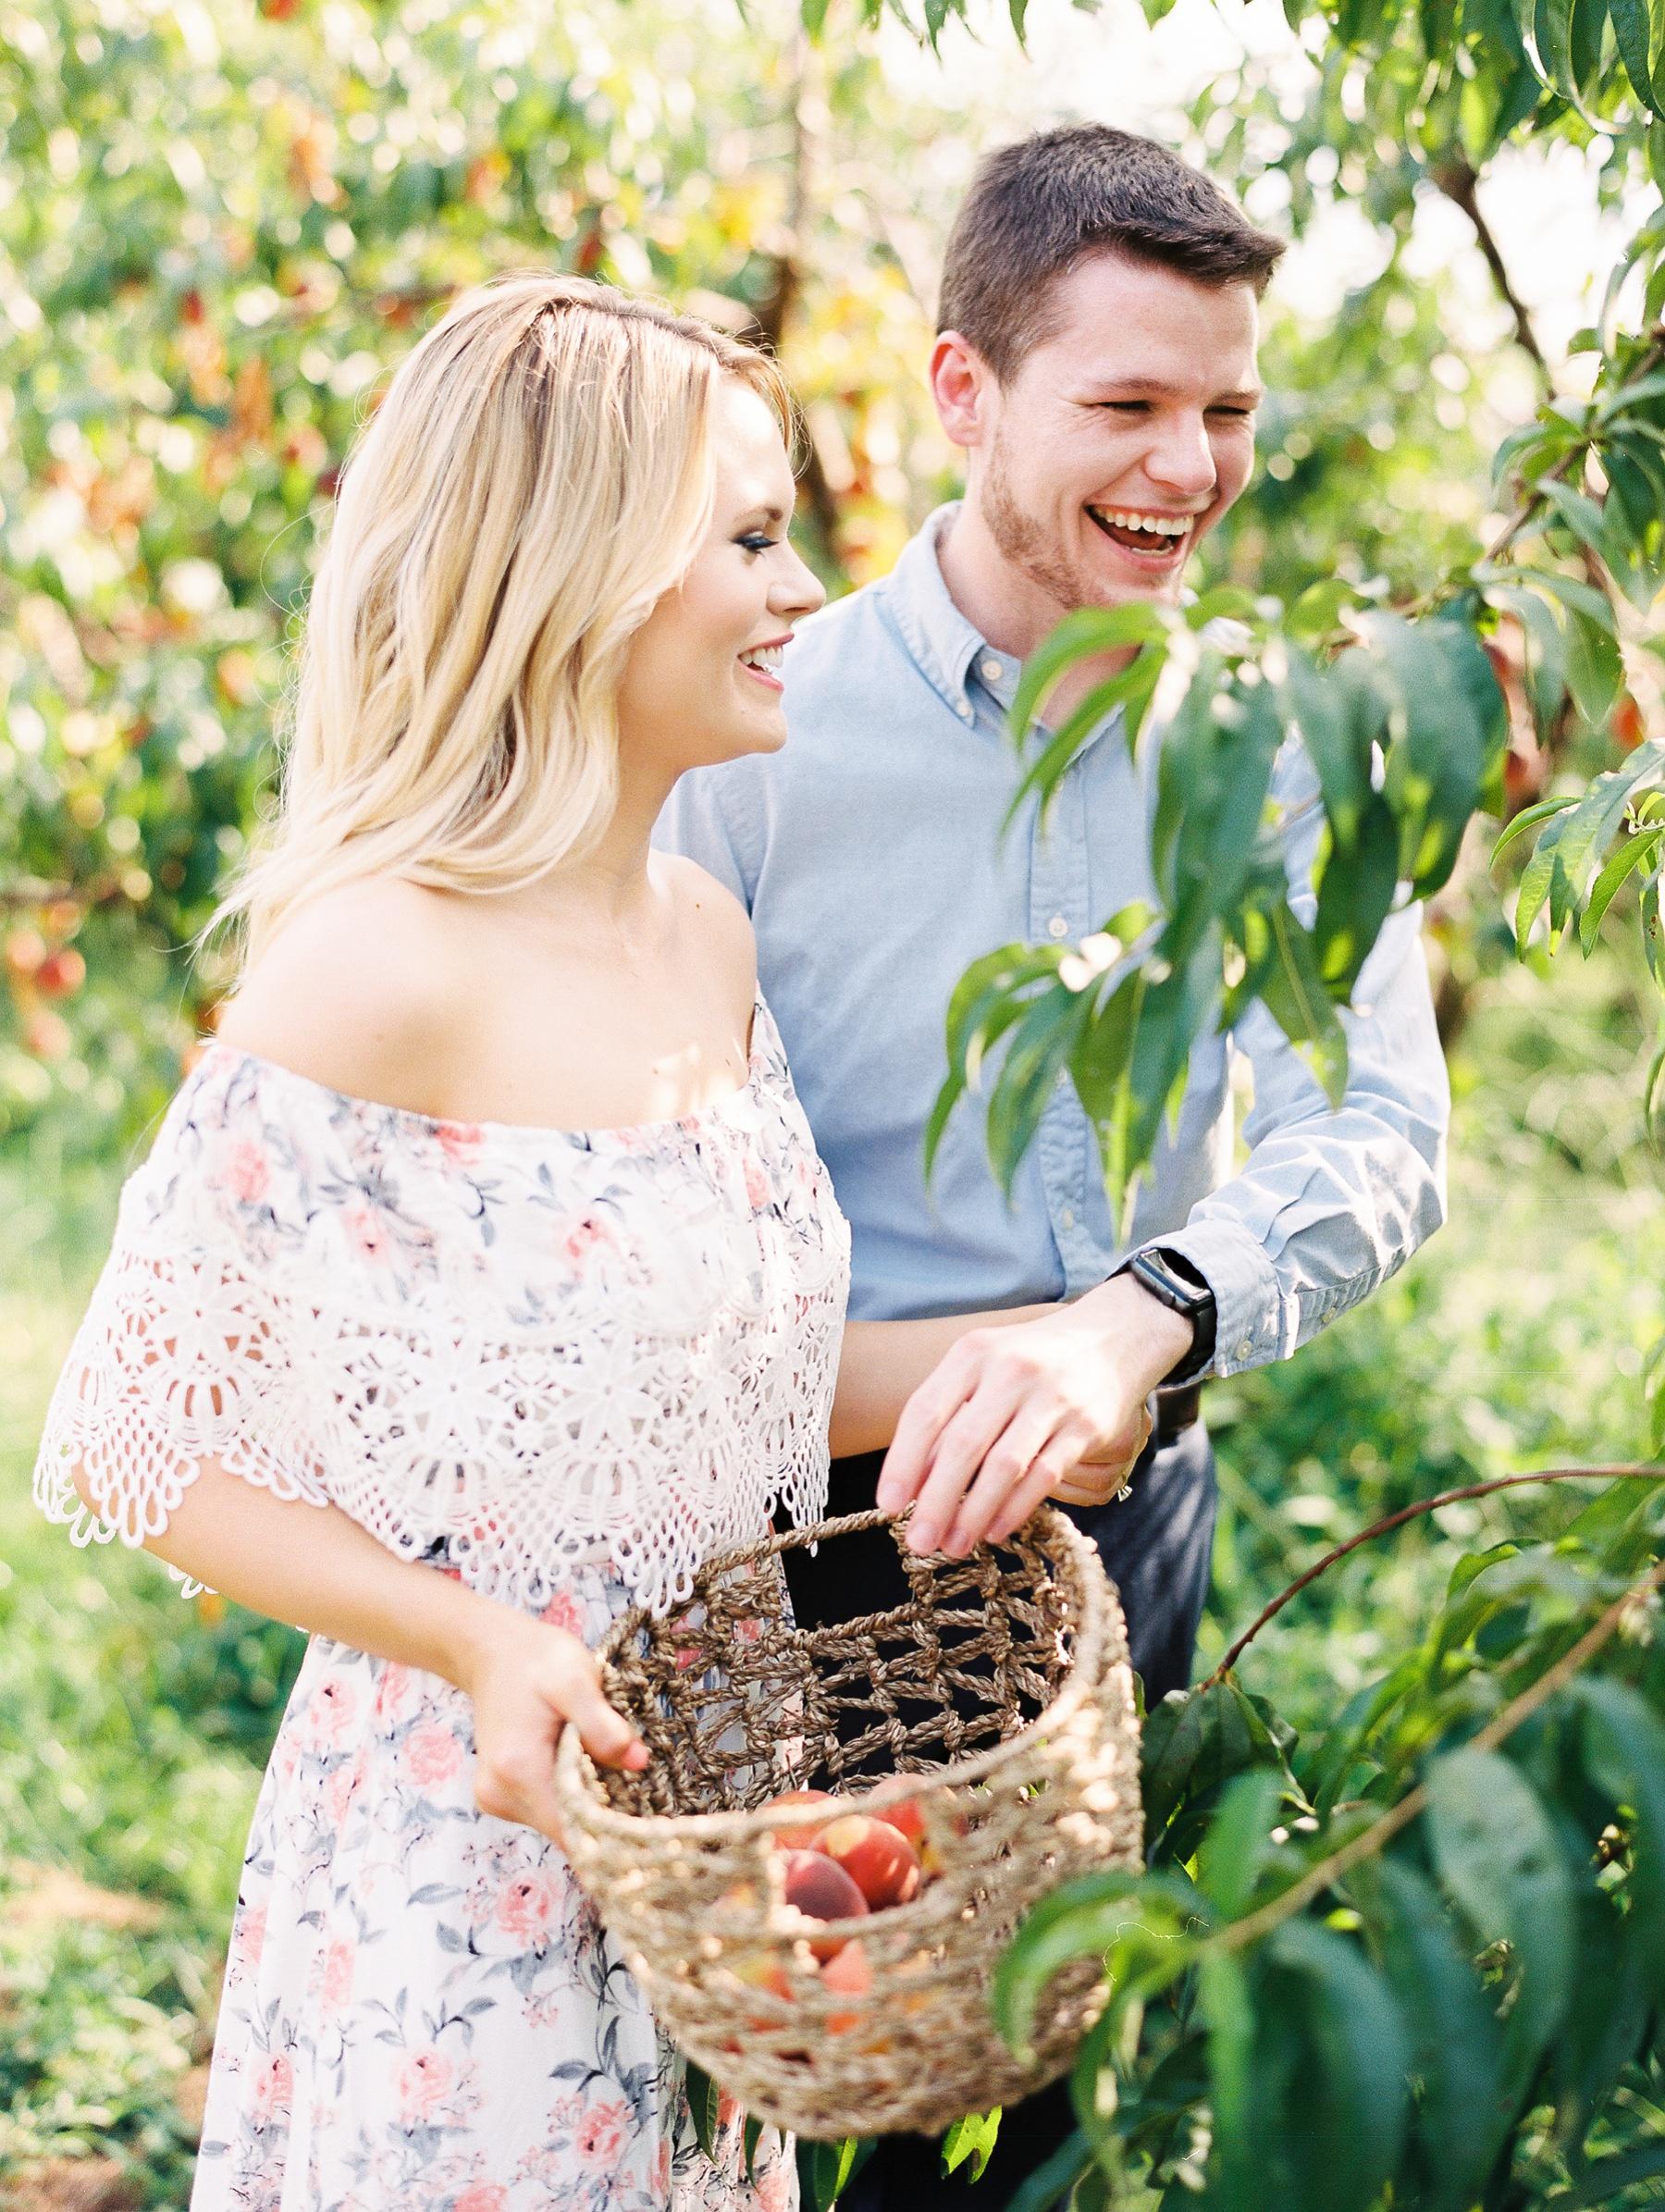 Peach-Orchard-Engagement-Session-Arkansas_0006.jpg